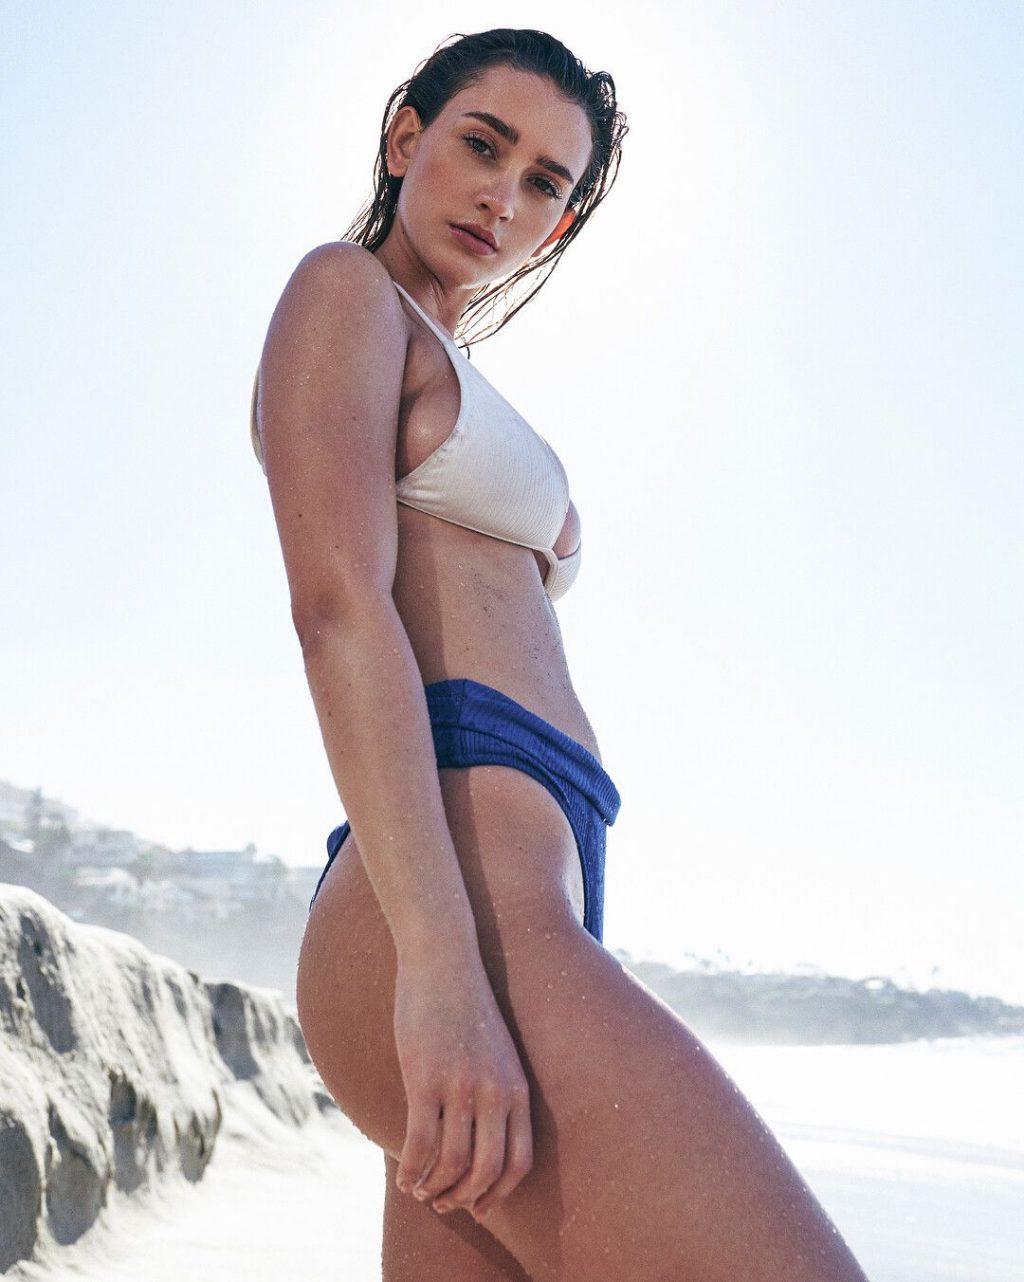 Jordyn Johnson Nude Sexy Thefappeningblog Com 55 1024x1282